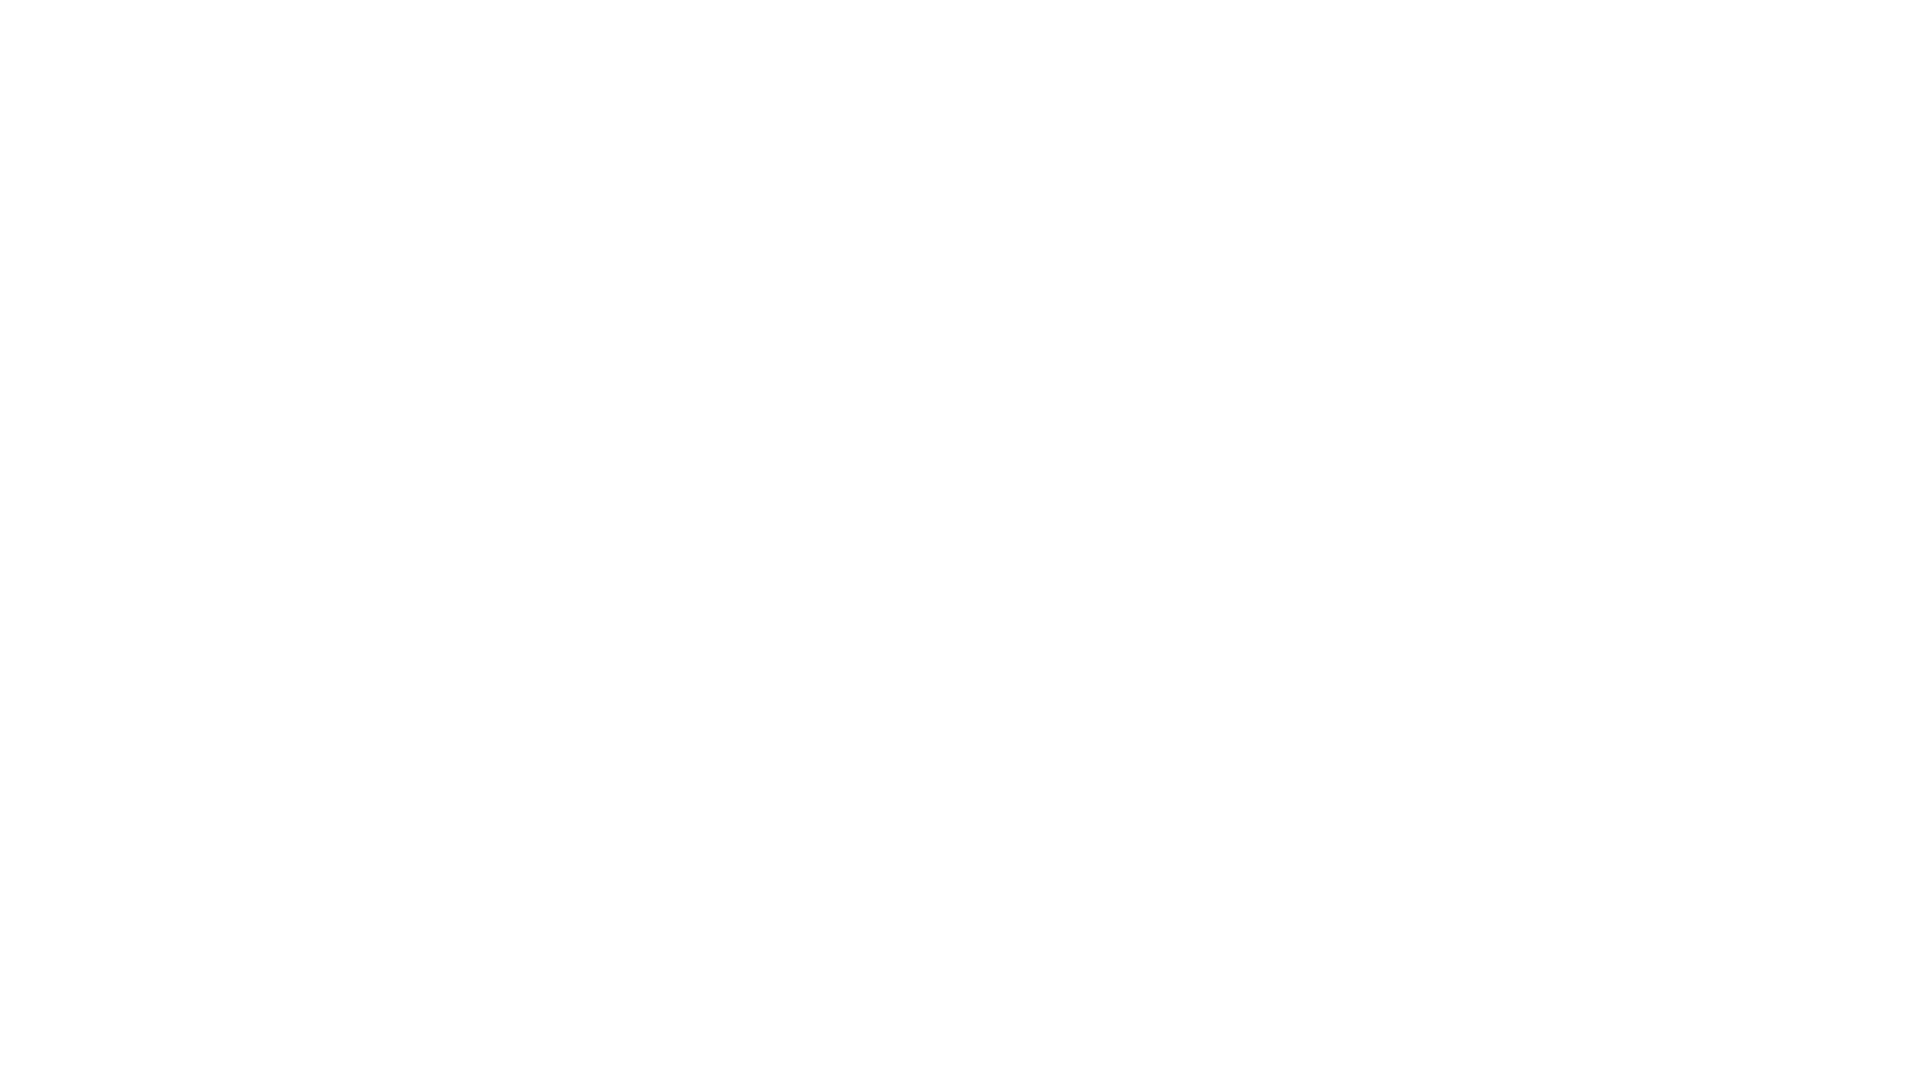 NGAGE-logo---white-on-transparent.png